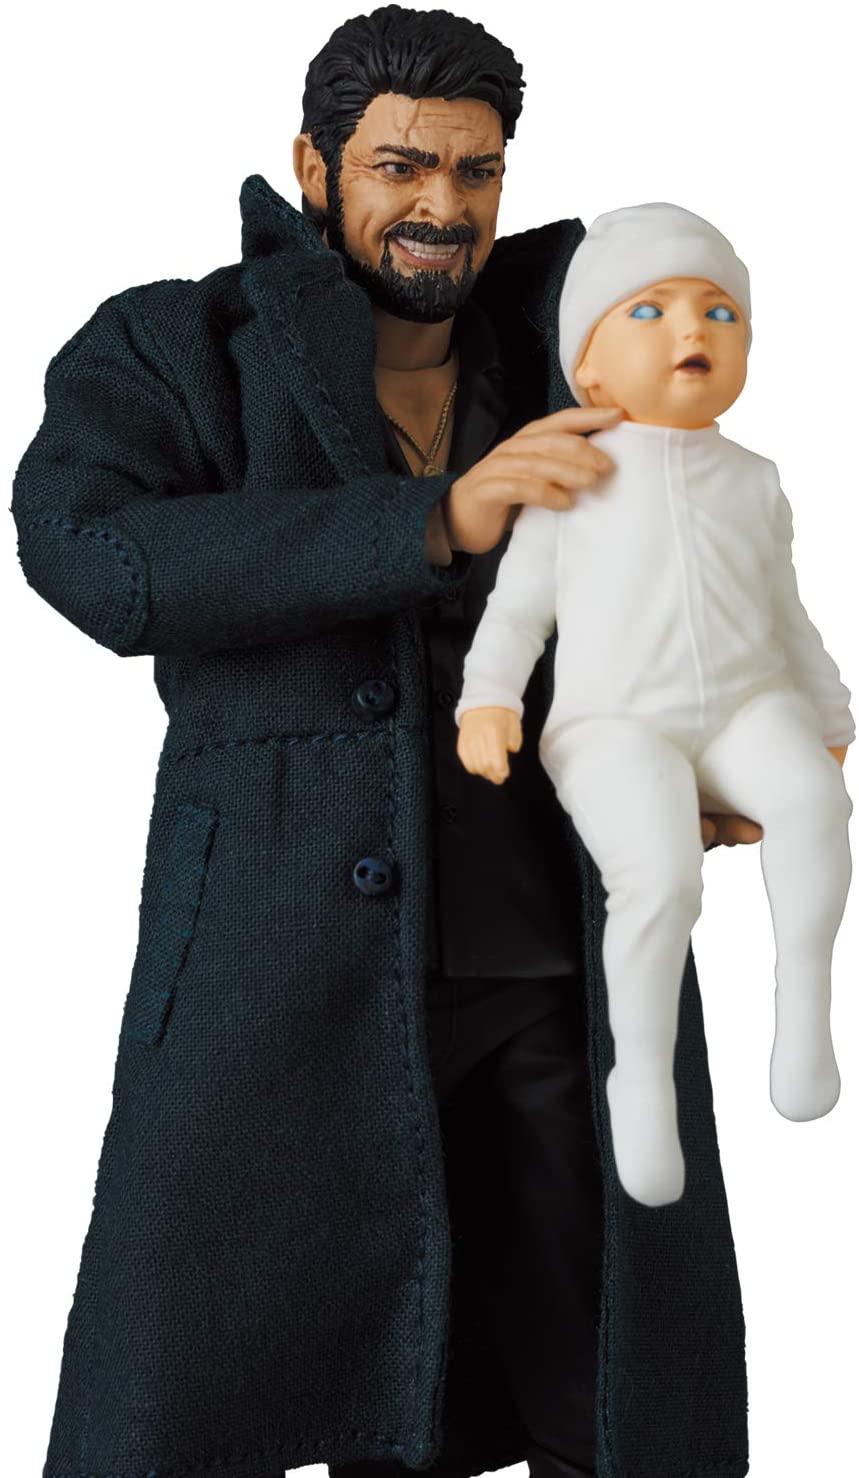 Link a MAFEX-Billy-Butcher-The-Boys-Medicom Toy- (9)